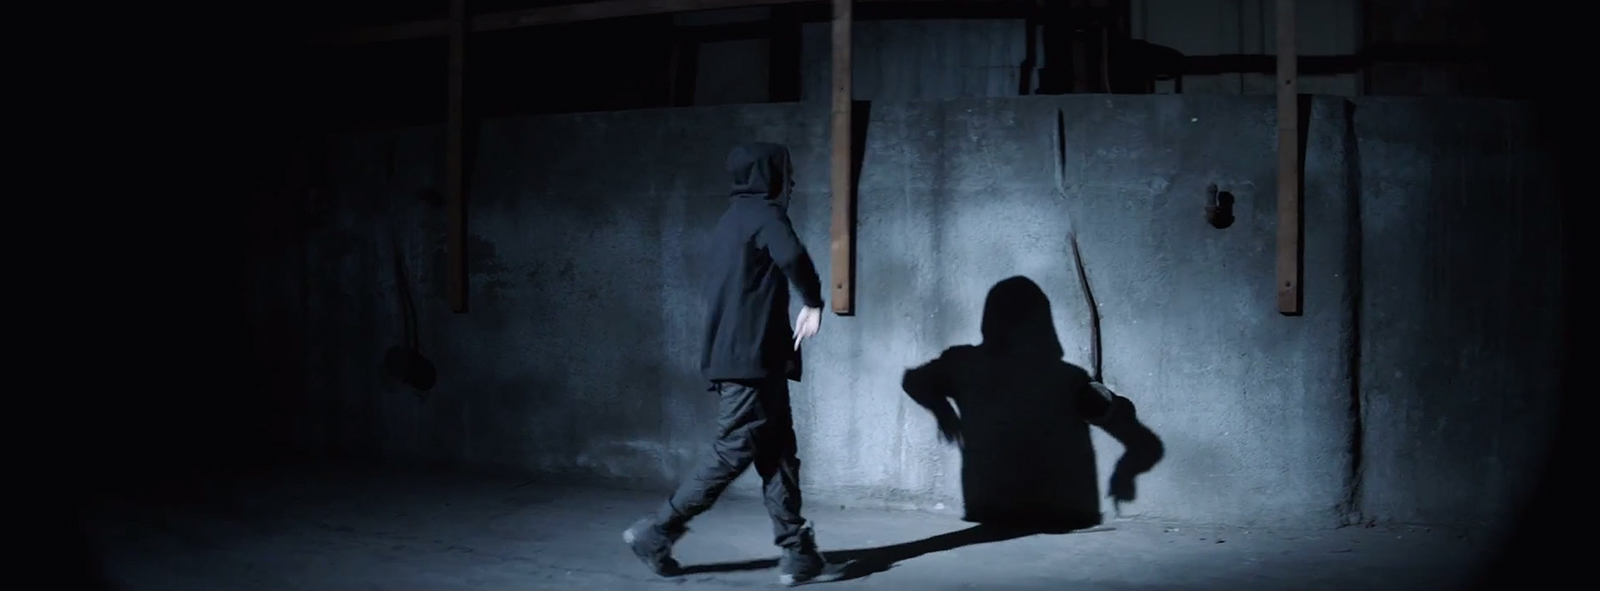 Eminem – Guts Over Fear ft. Sia